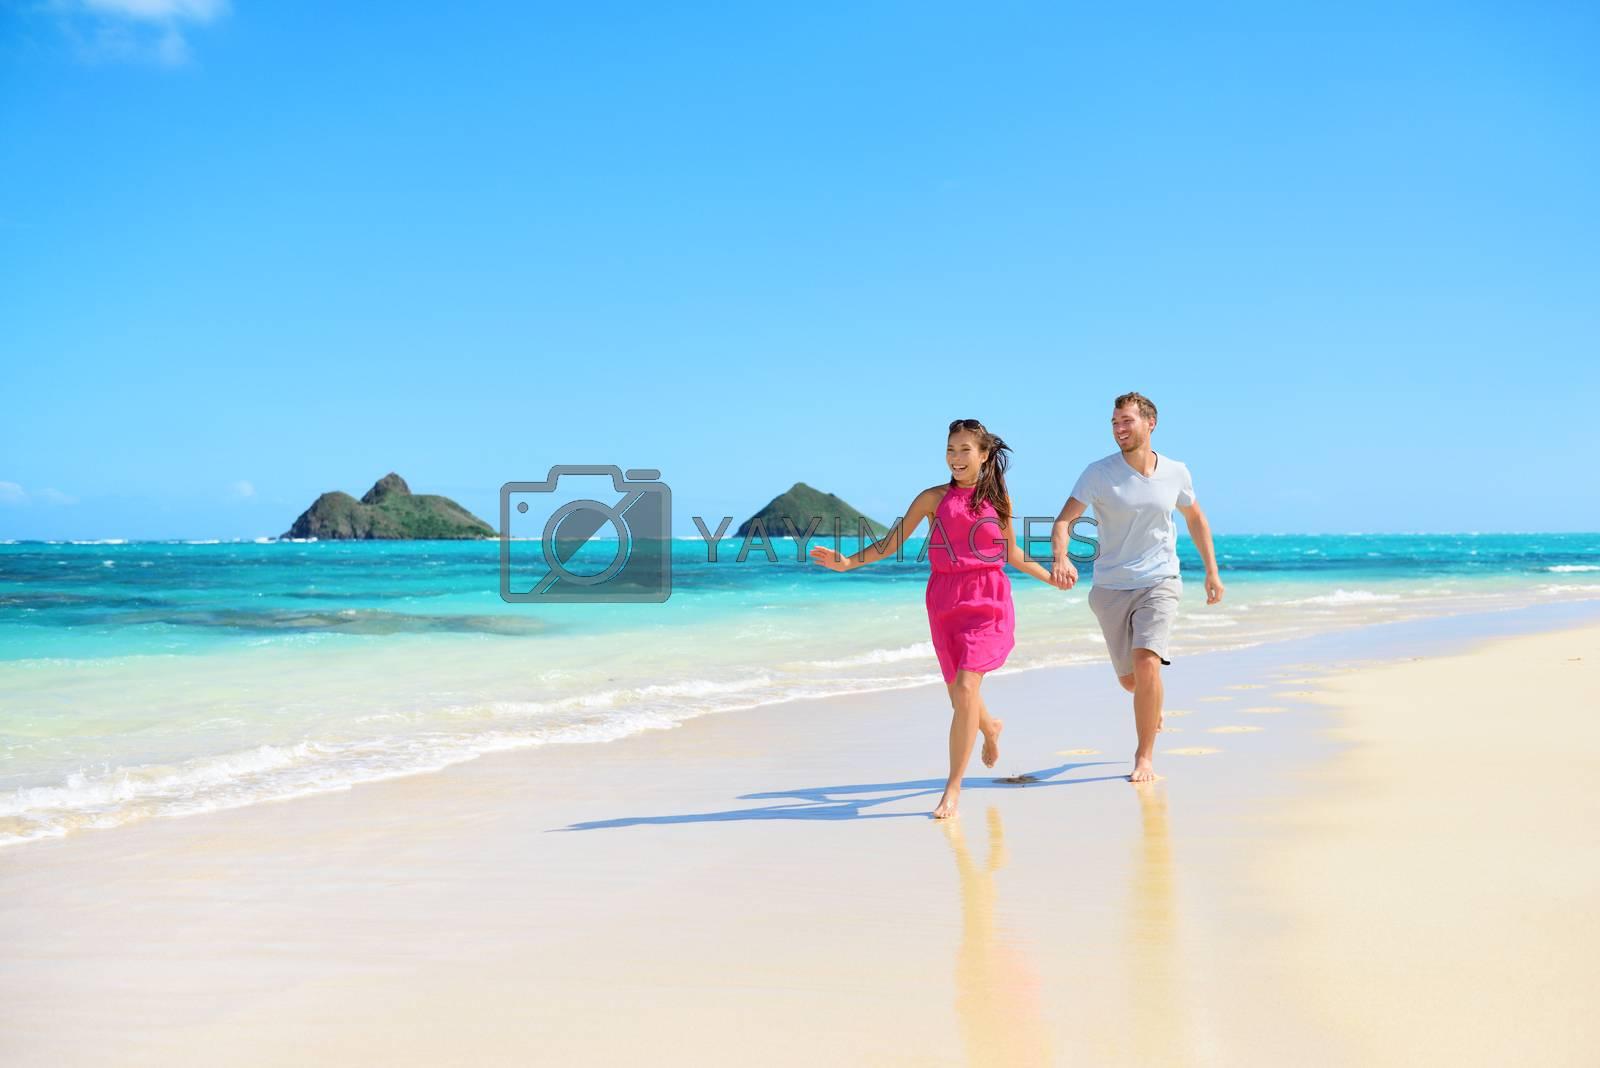 Beach happy couple on running having fun on Hawaii. Romantic couple joyful and full of happiness on travel vacation on Lanikai beach, Oahu, Hawaii, USA with Mokulua Islands. Asian woman, Caucasian man